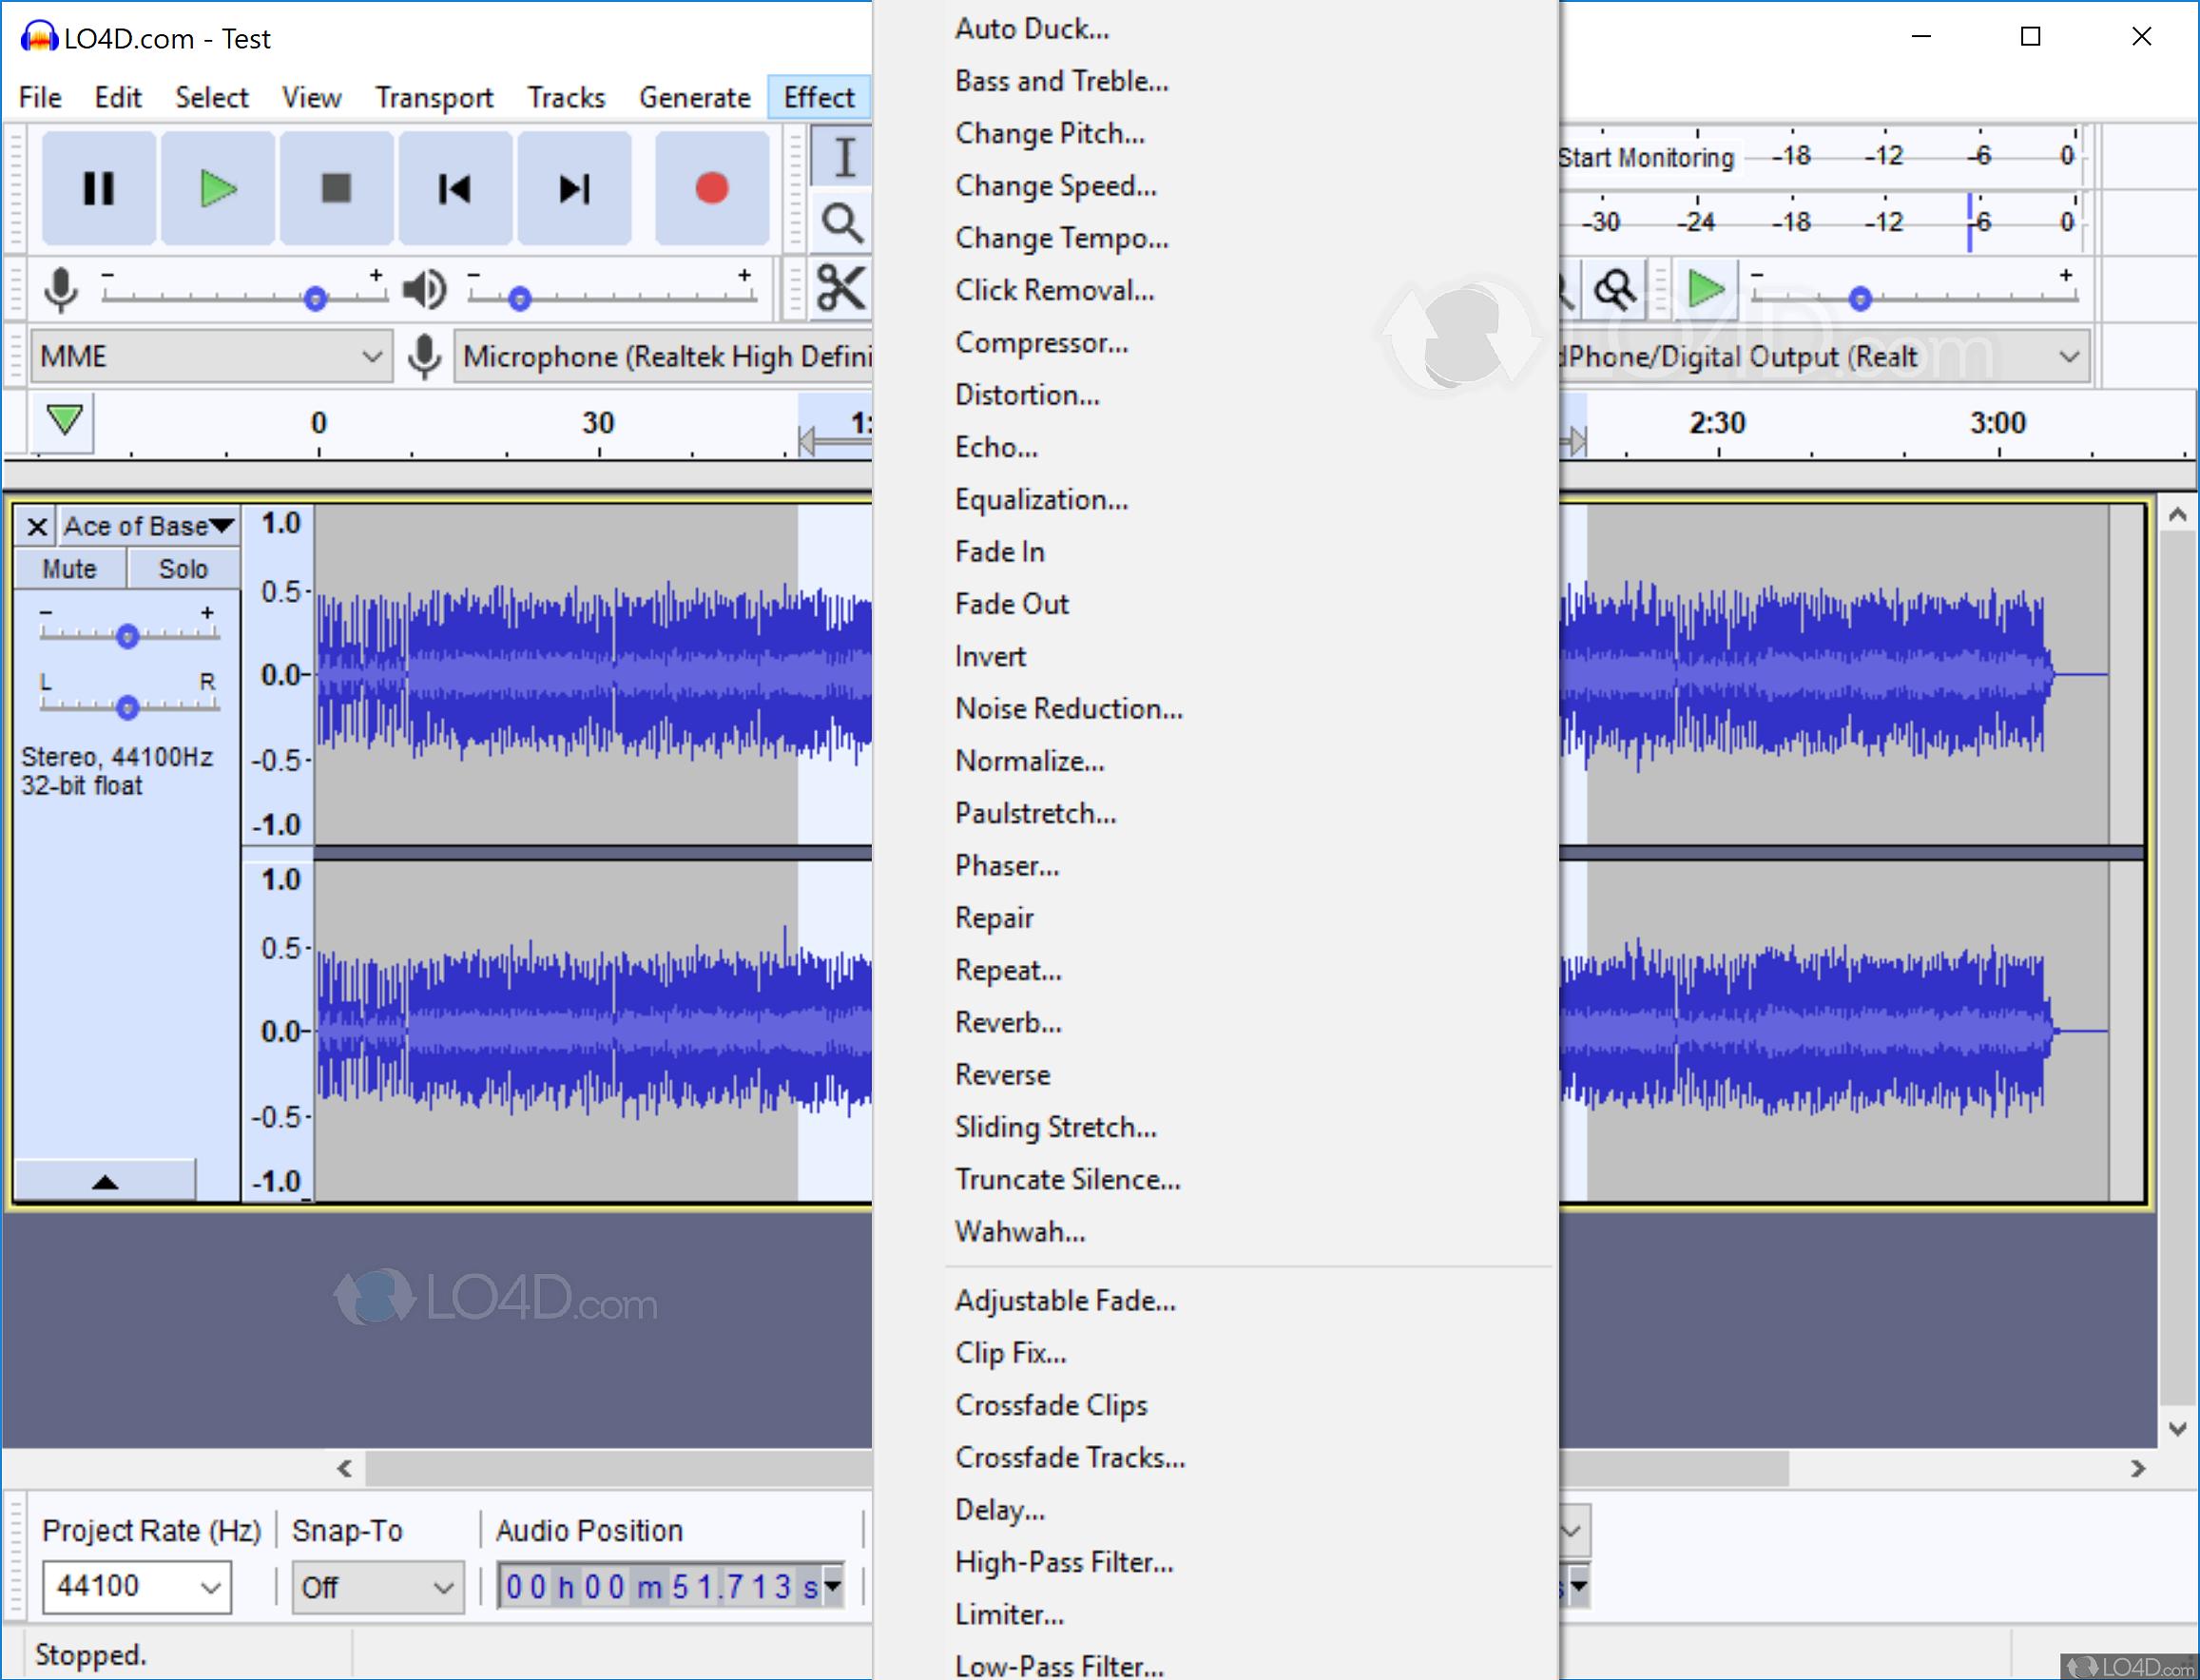 audacity full free download windows 7